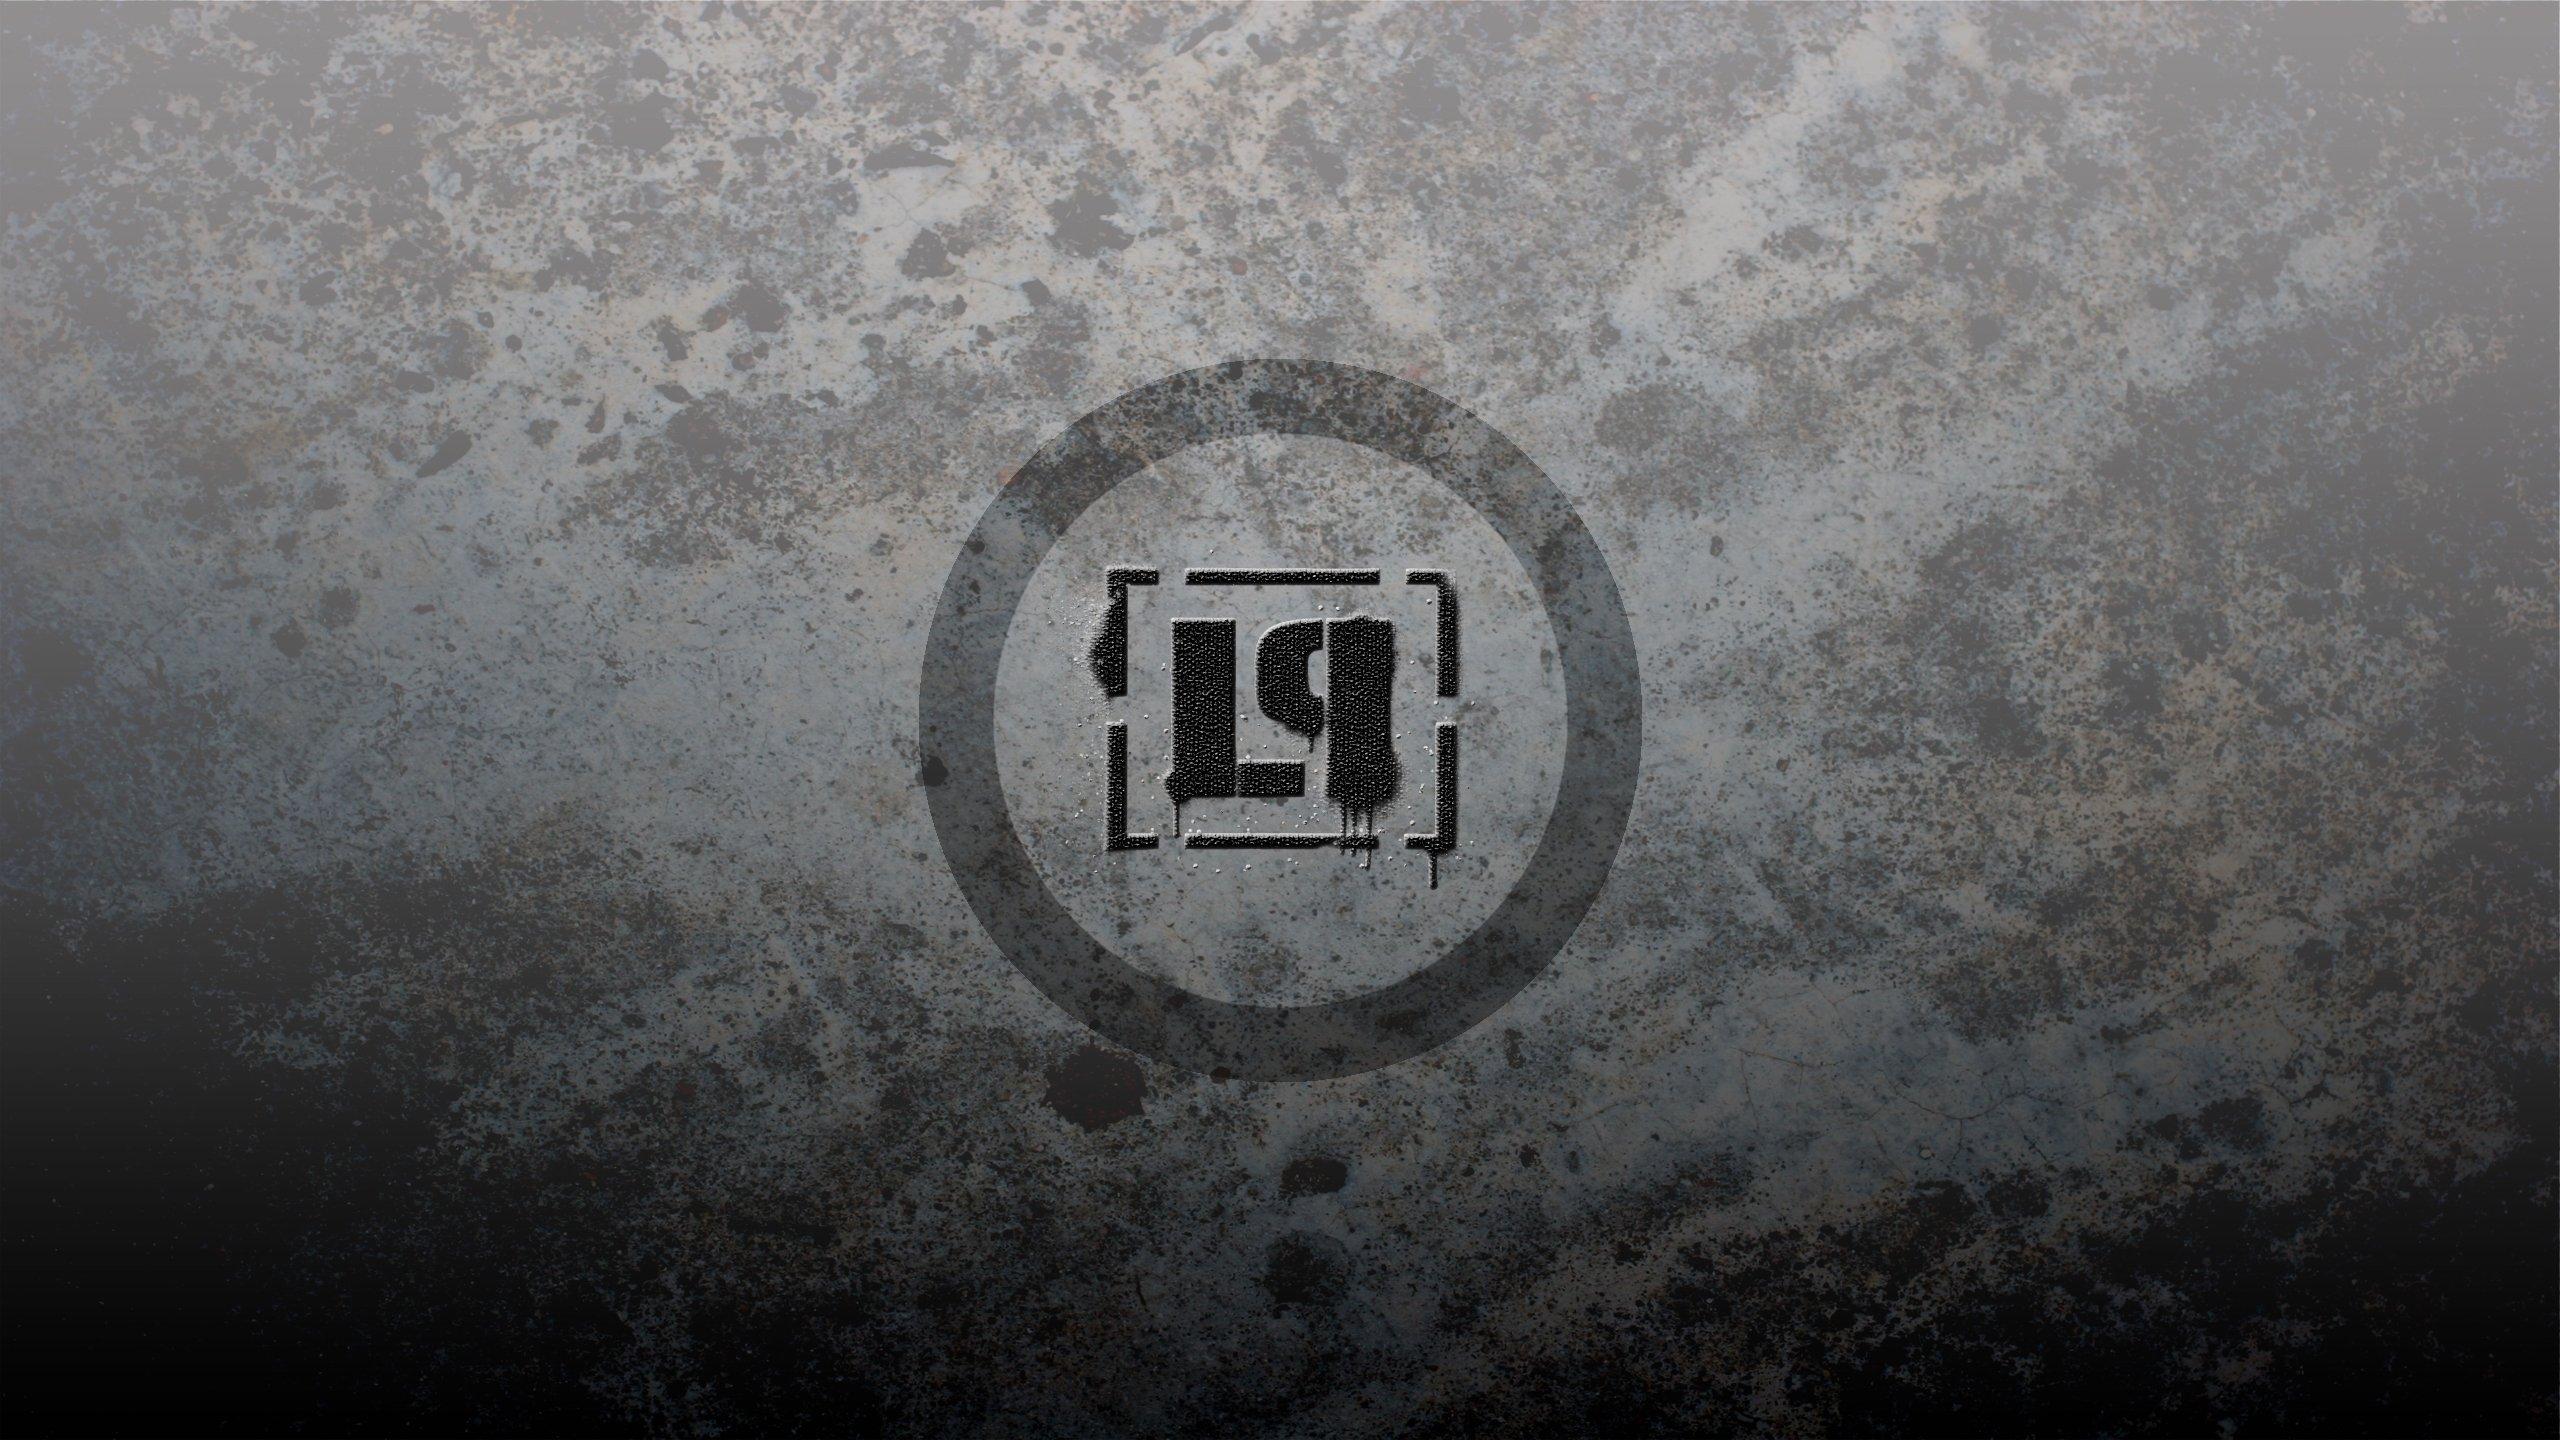 Linkin Park Wallpaper Ultra Hd Linkin Park 594869 Hd